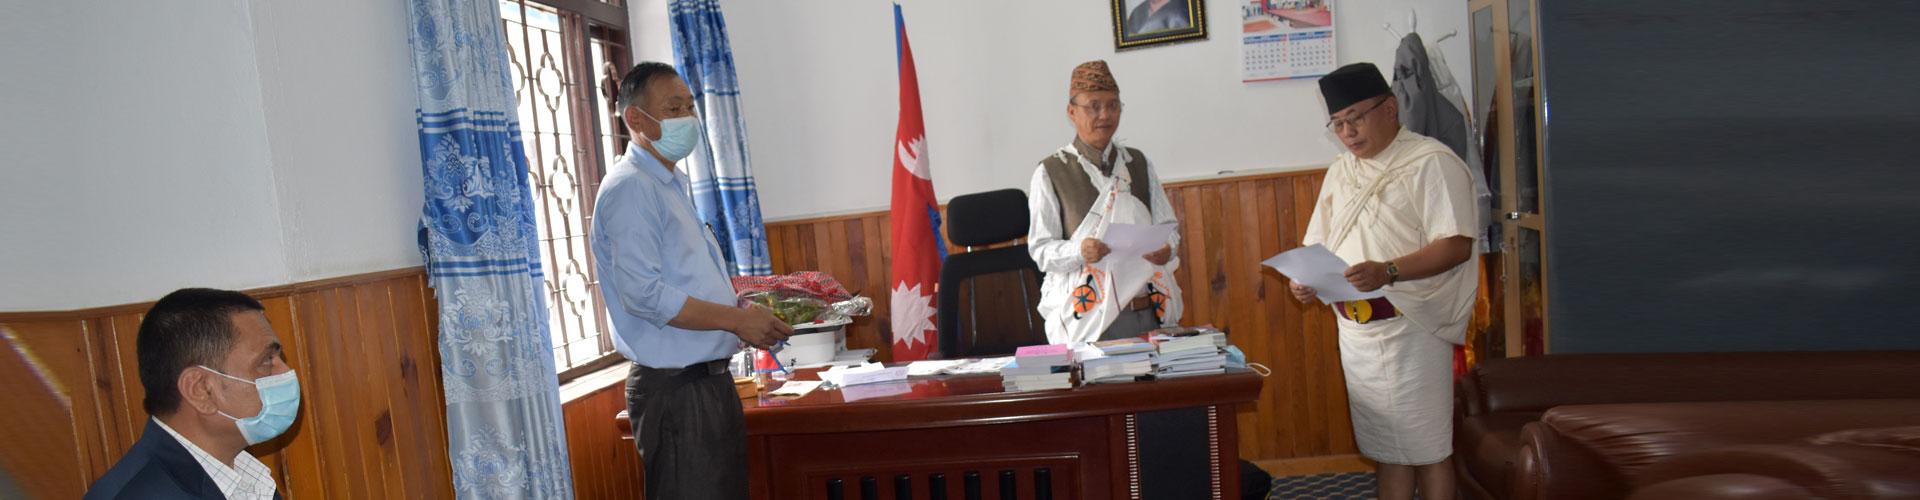 आयोगका अध्यक्ष माननीय राम बहादुर थापामगरज्यूले आयोगका सदस्य माननीय सुर्य बहादुर गुरूङज्यूलाई  सपथ ग्रहण गराउनुहुँदै